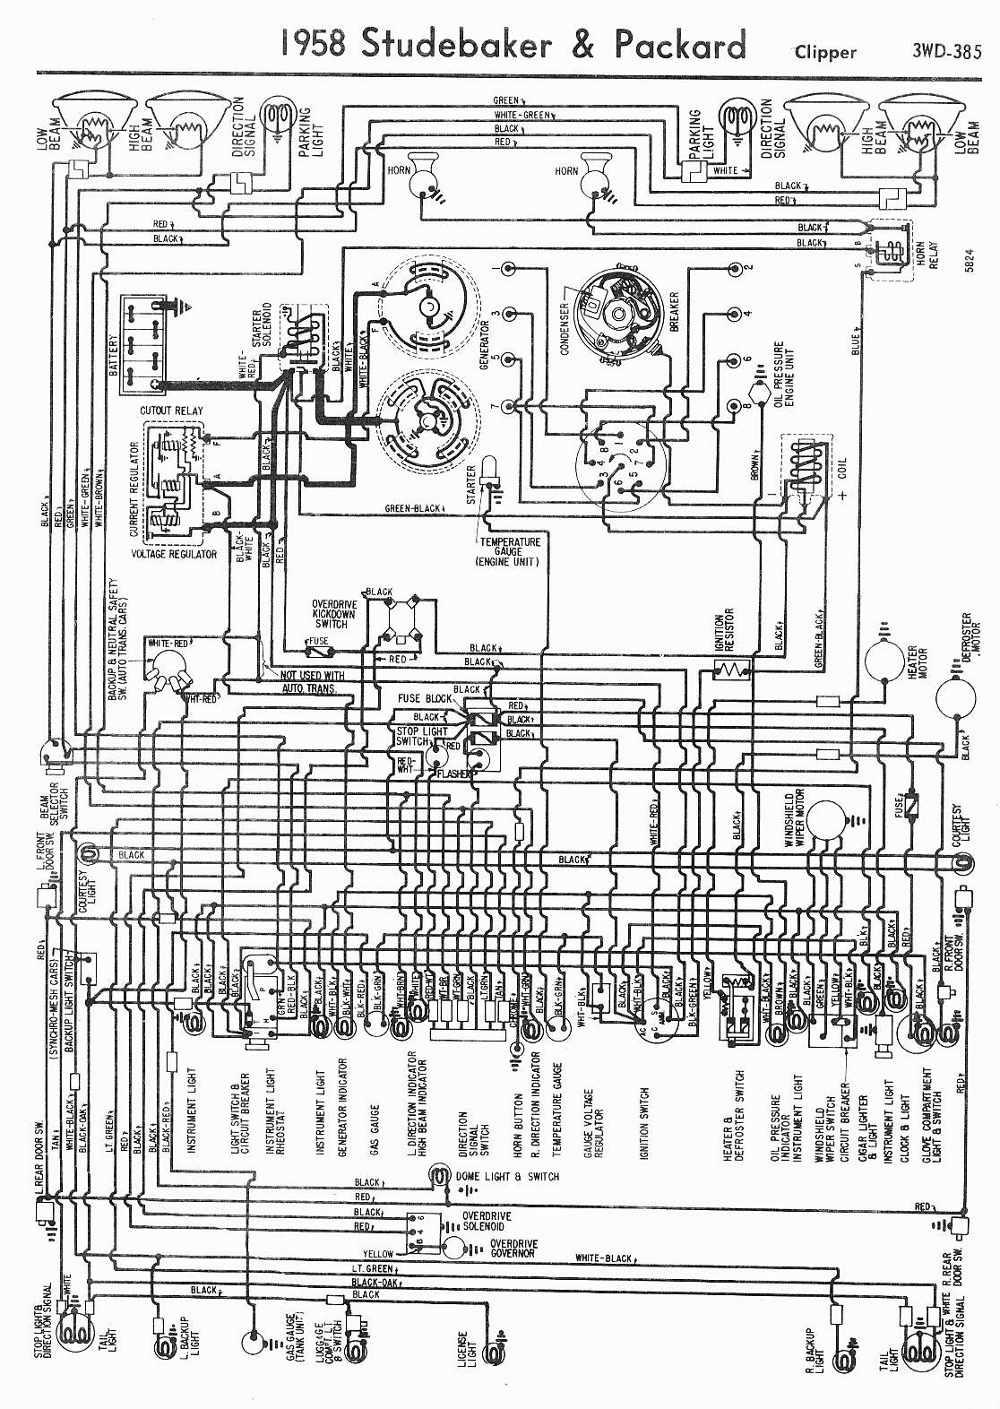 hight resolution of 1948 packard wiring diagram simple wiring diagrams 1943 packard 1949 packard wiring diagram